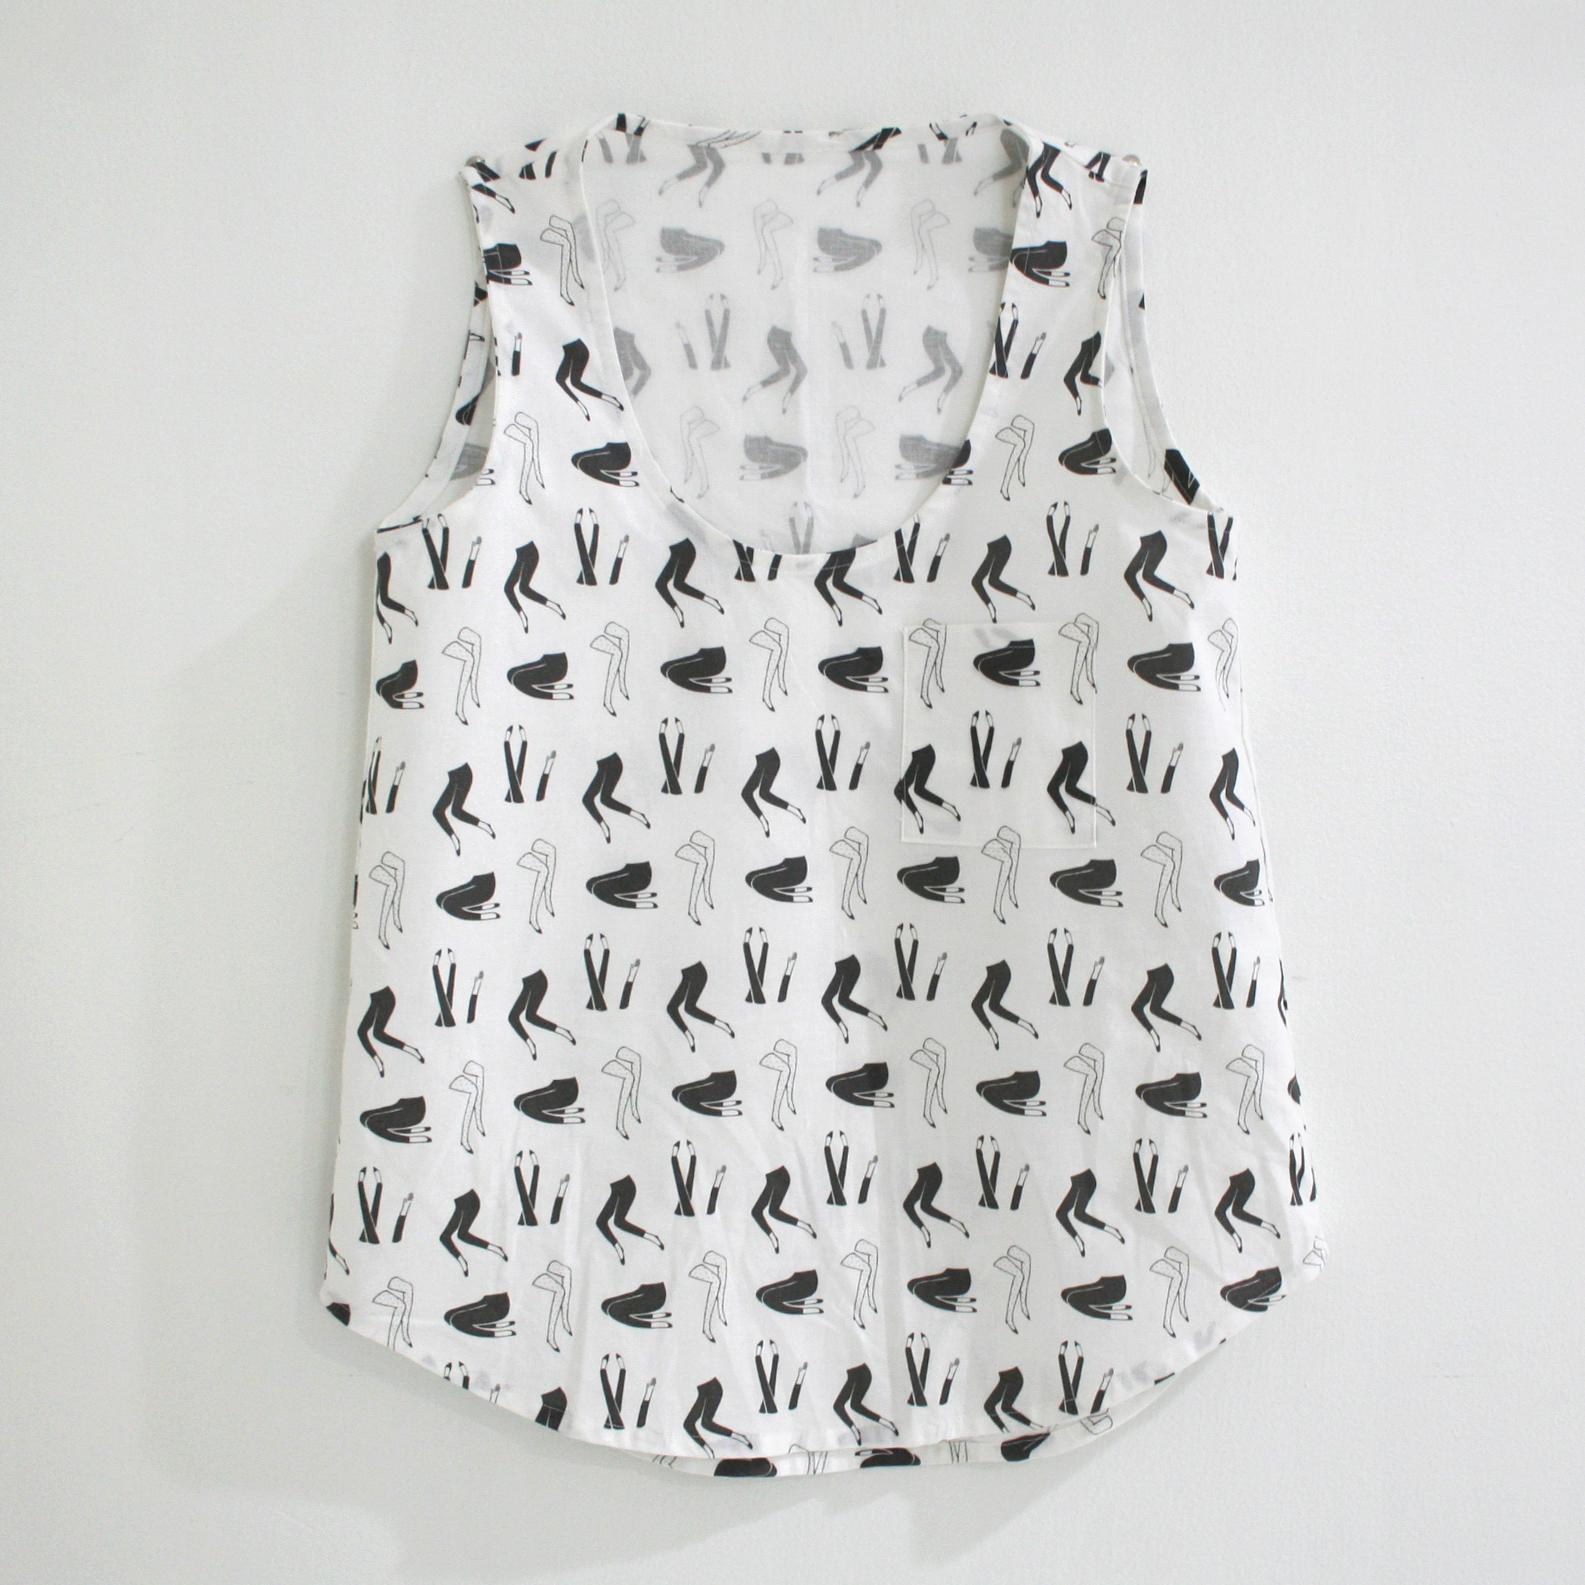 Tank top sewn from custom-printed fabric.